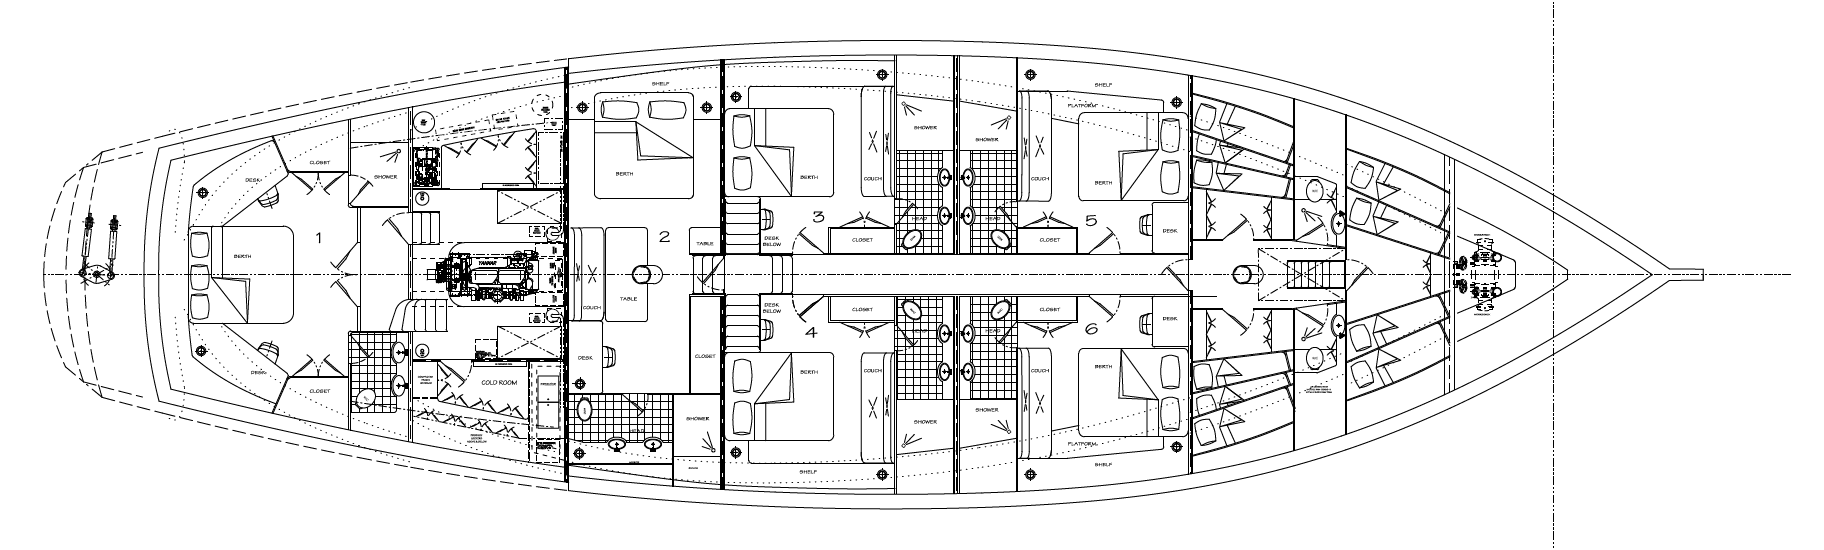 ship design methodologies of preliminary design pdf